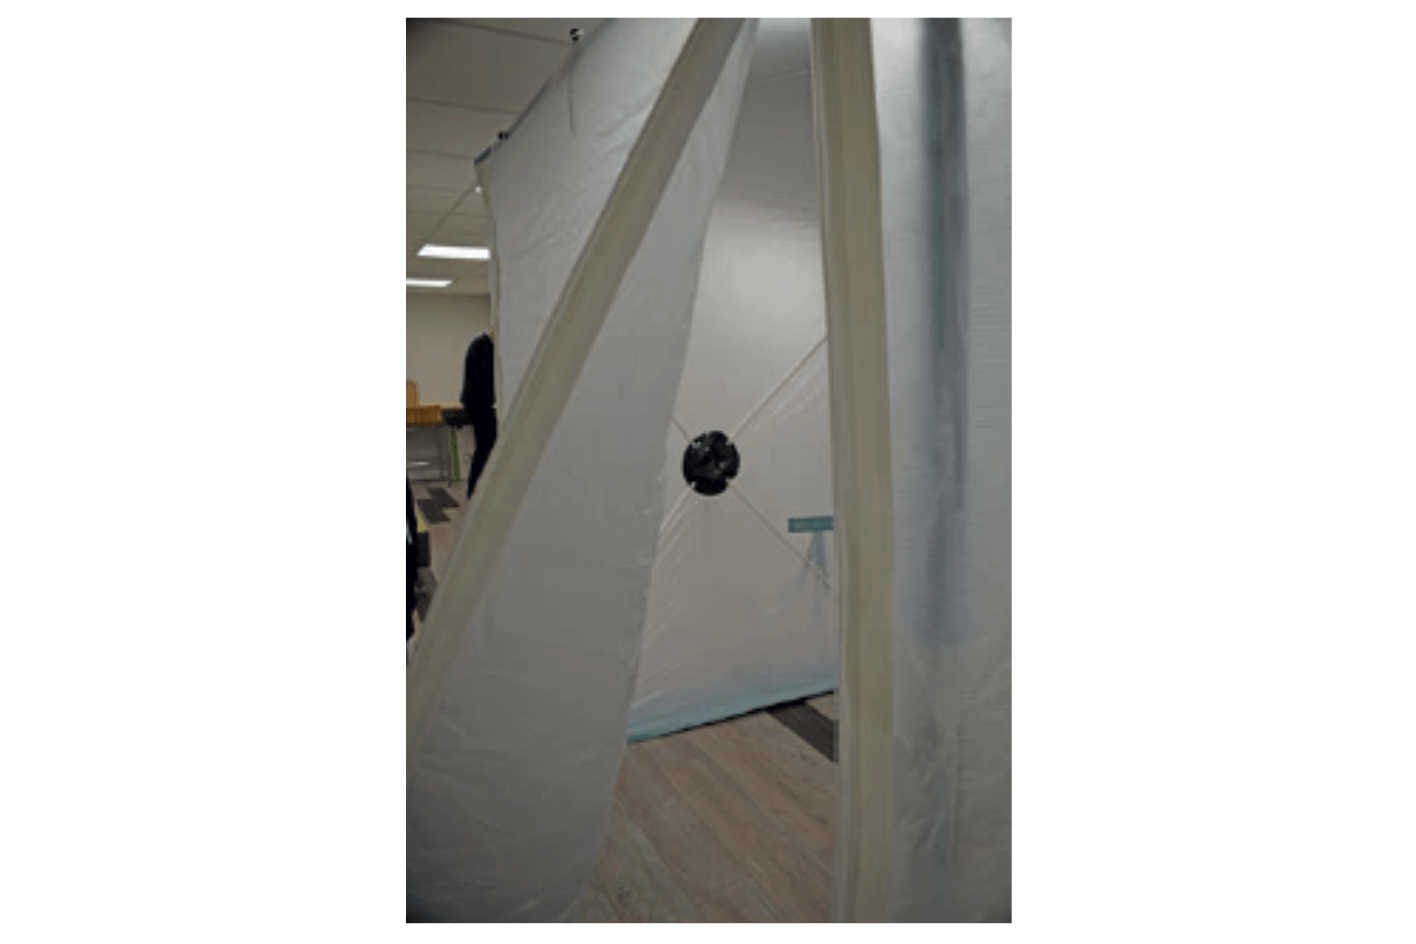 Mini Dust Enclosure for Hire